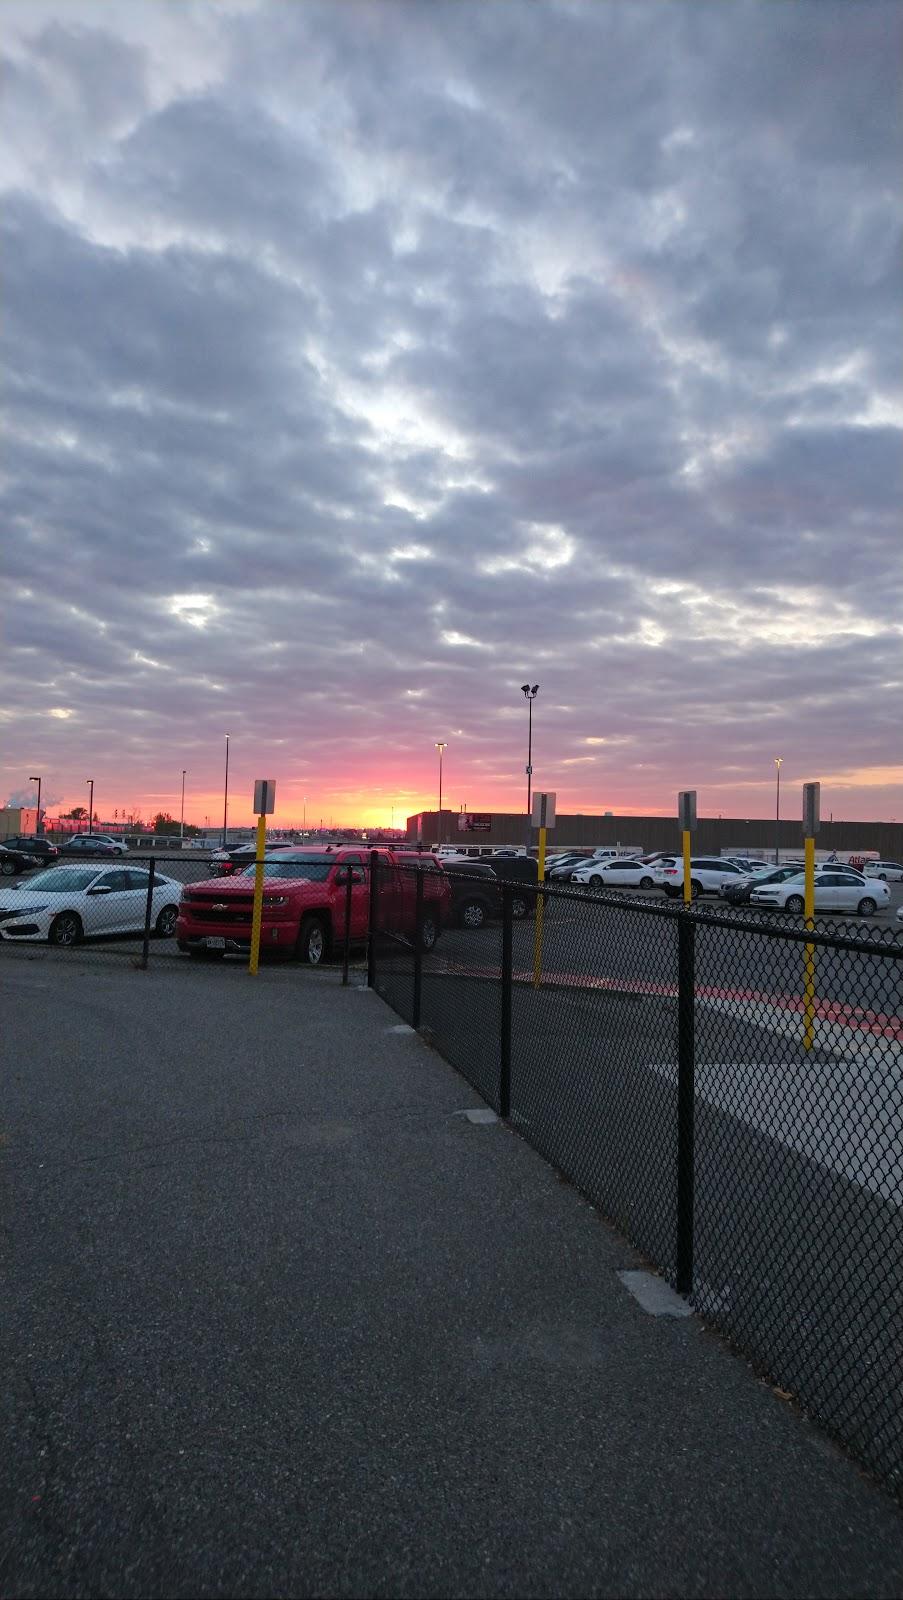 915 Bloor St W Parking   parking   915 Bloor St W, Oshawa, ON L1J 5Y7, Canada